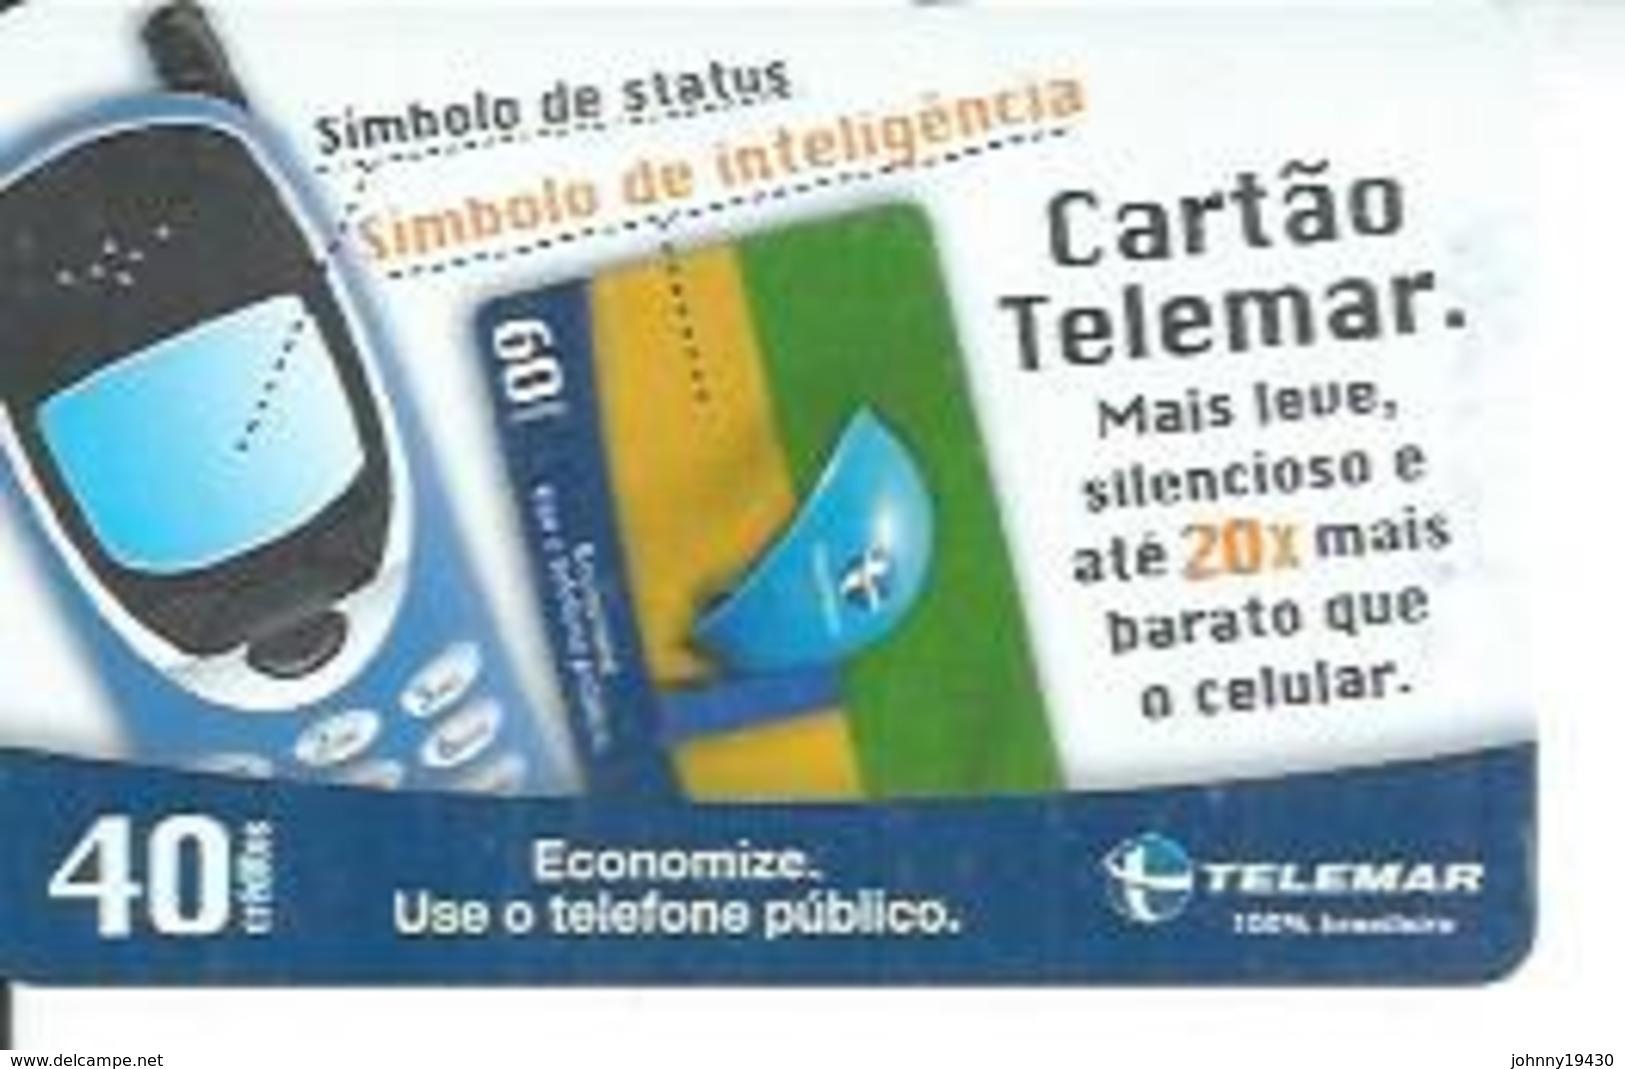 TELEMAR 40 - SIMBOLO DE STATUS   - BRESIL 03/2003 - Brésil